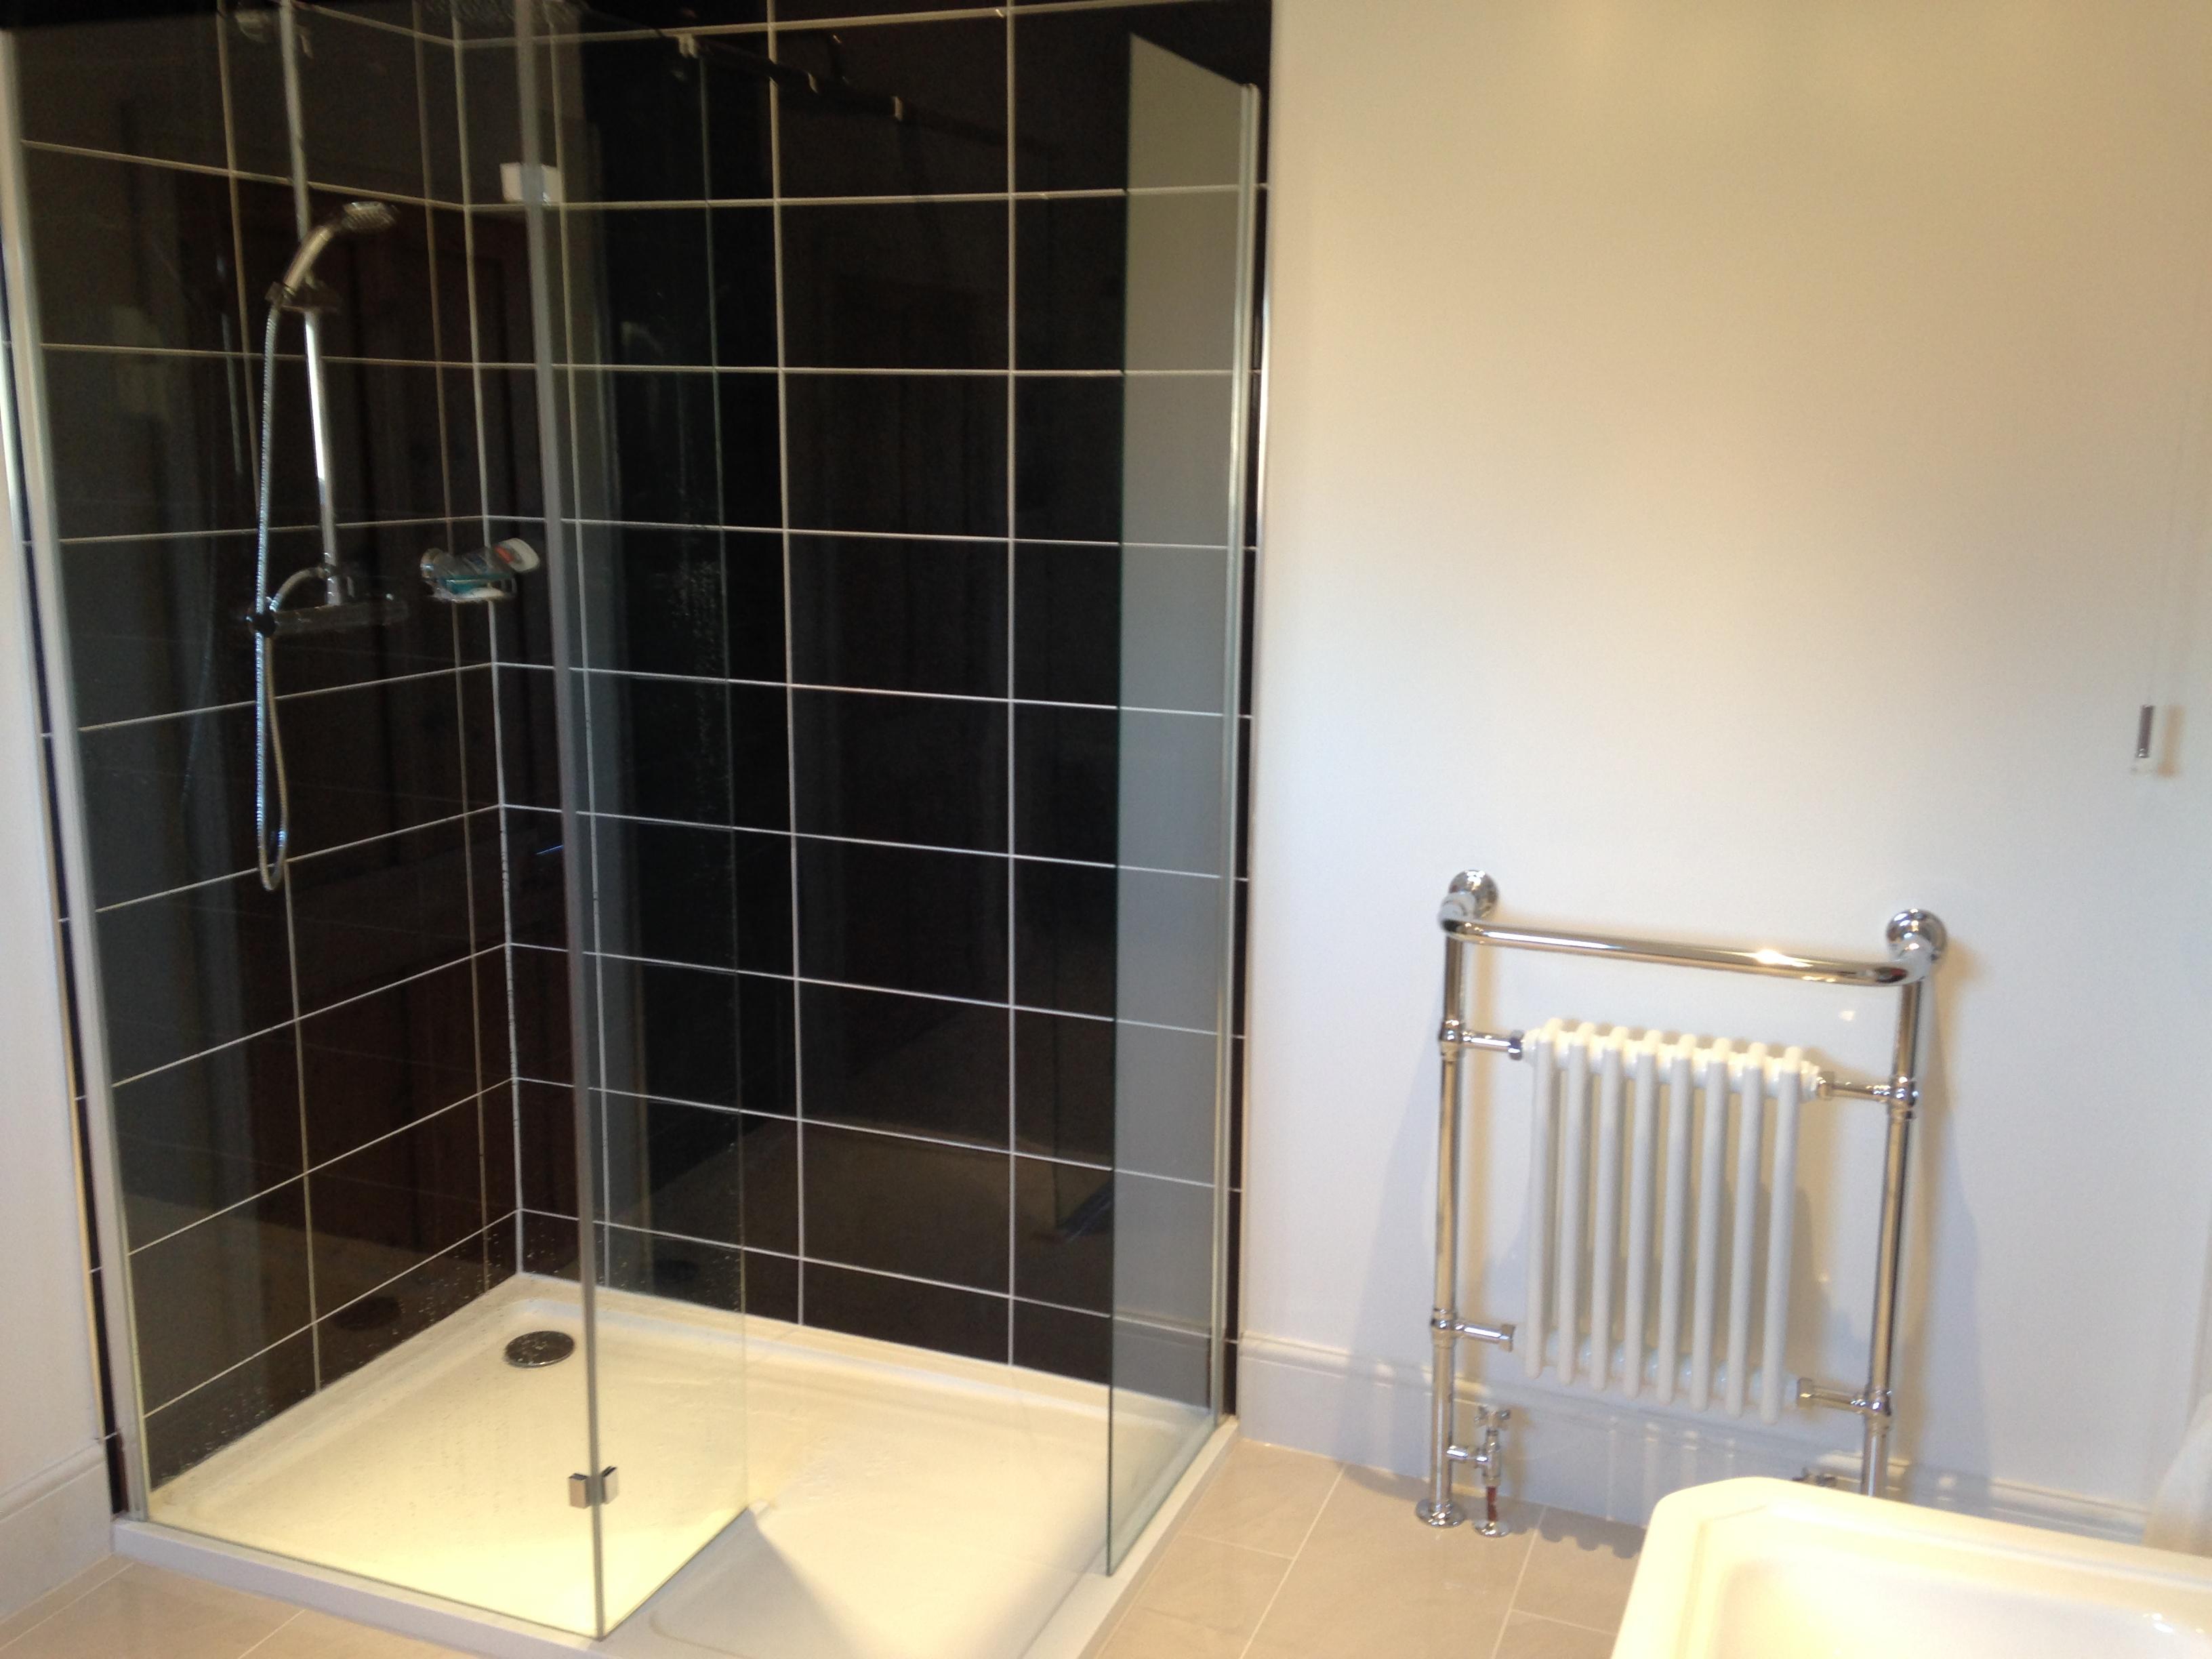 Plumbing steve clifford plumbing ltd for Full bathroom installation